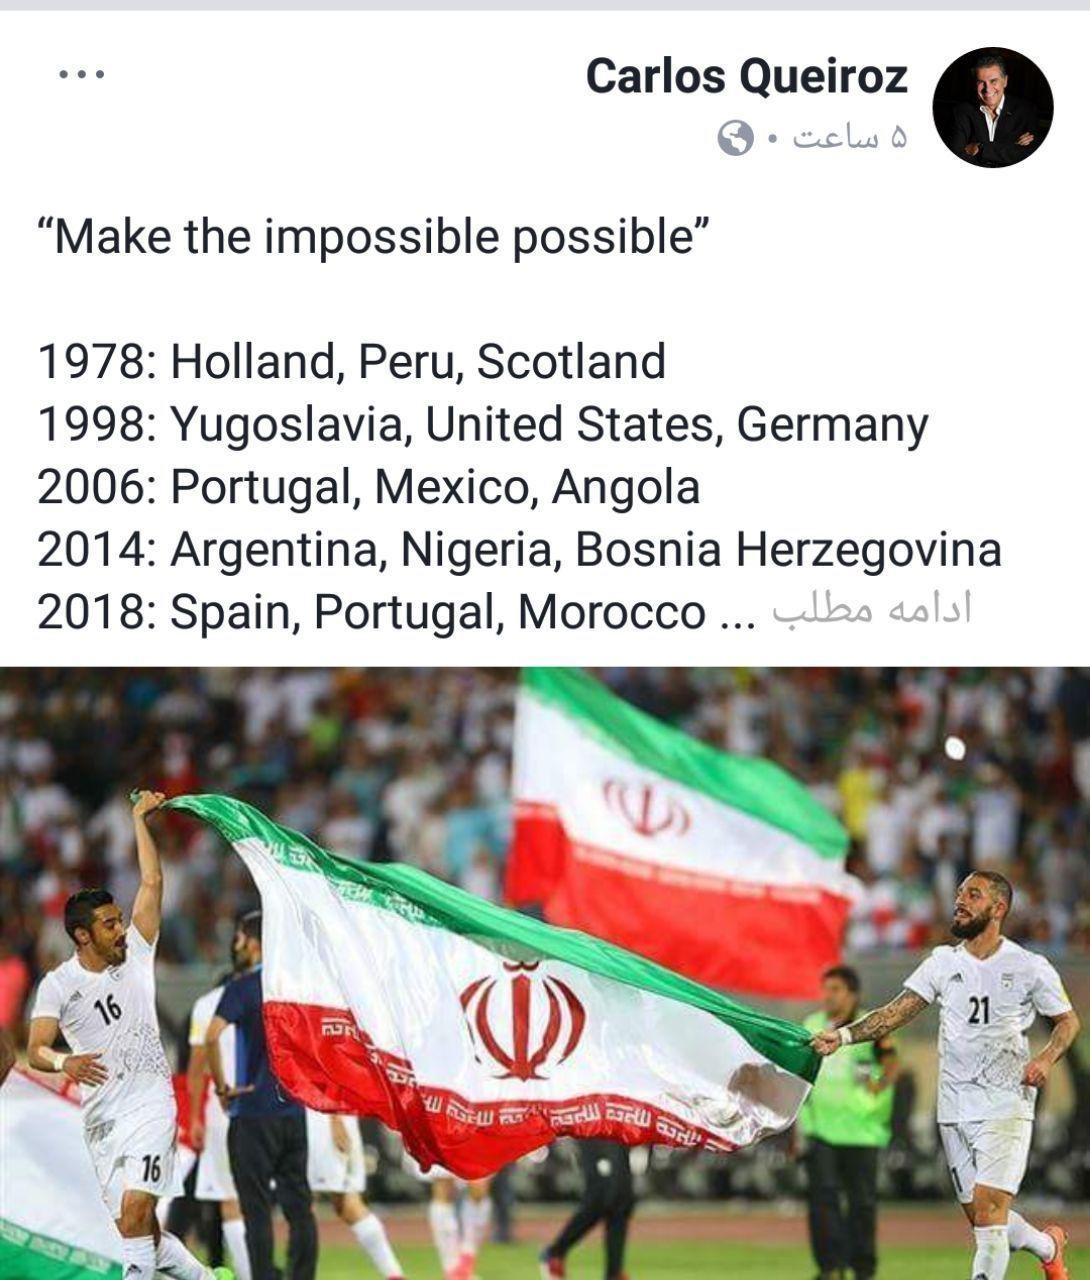 عکس خبري -پست جديد فيسبوک کيروش:غيرممکن را ممکن کن